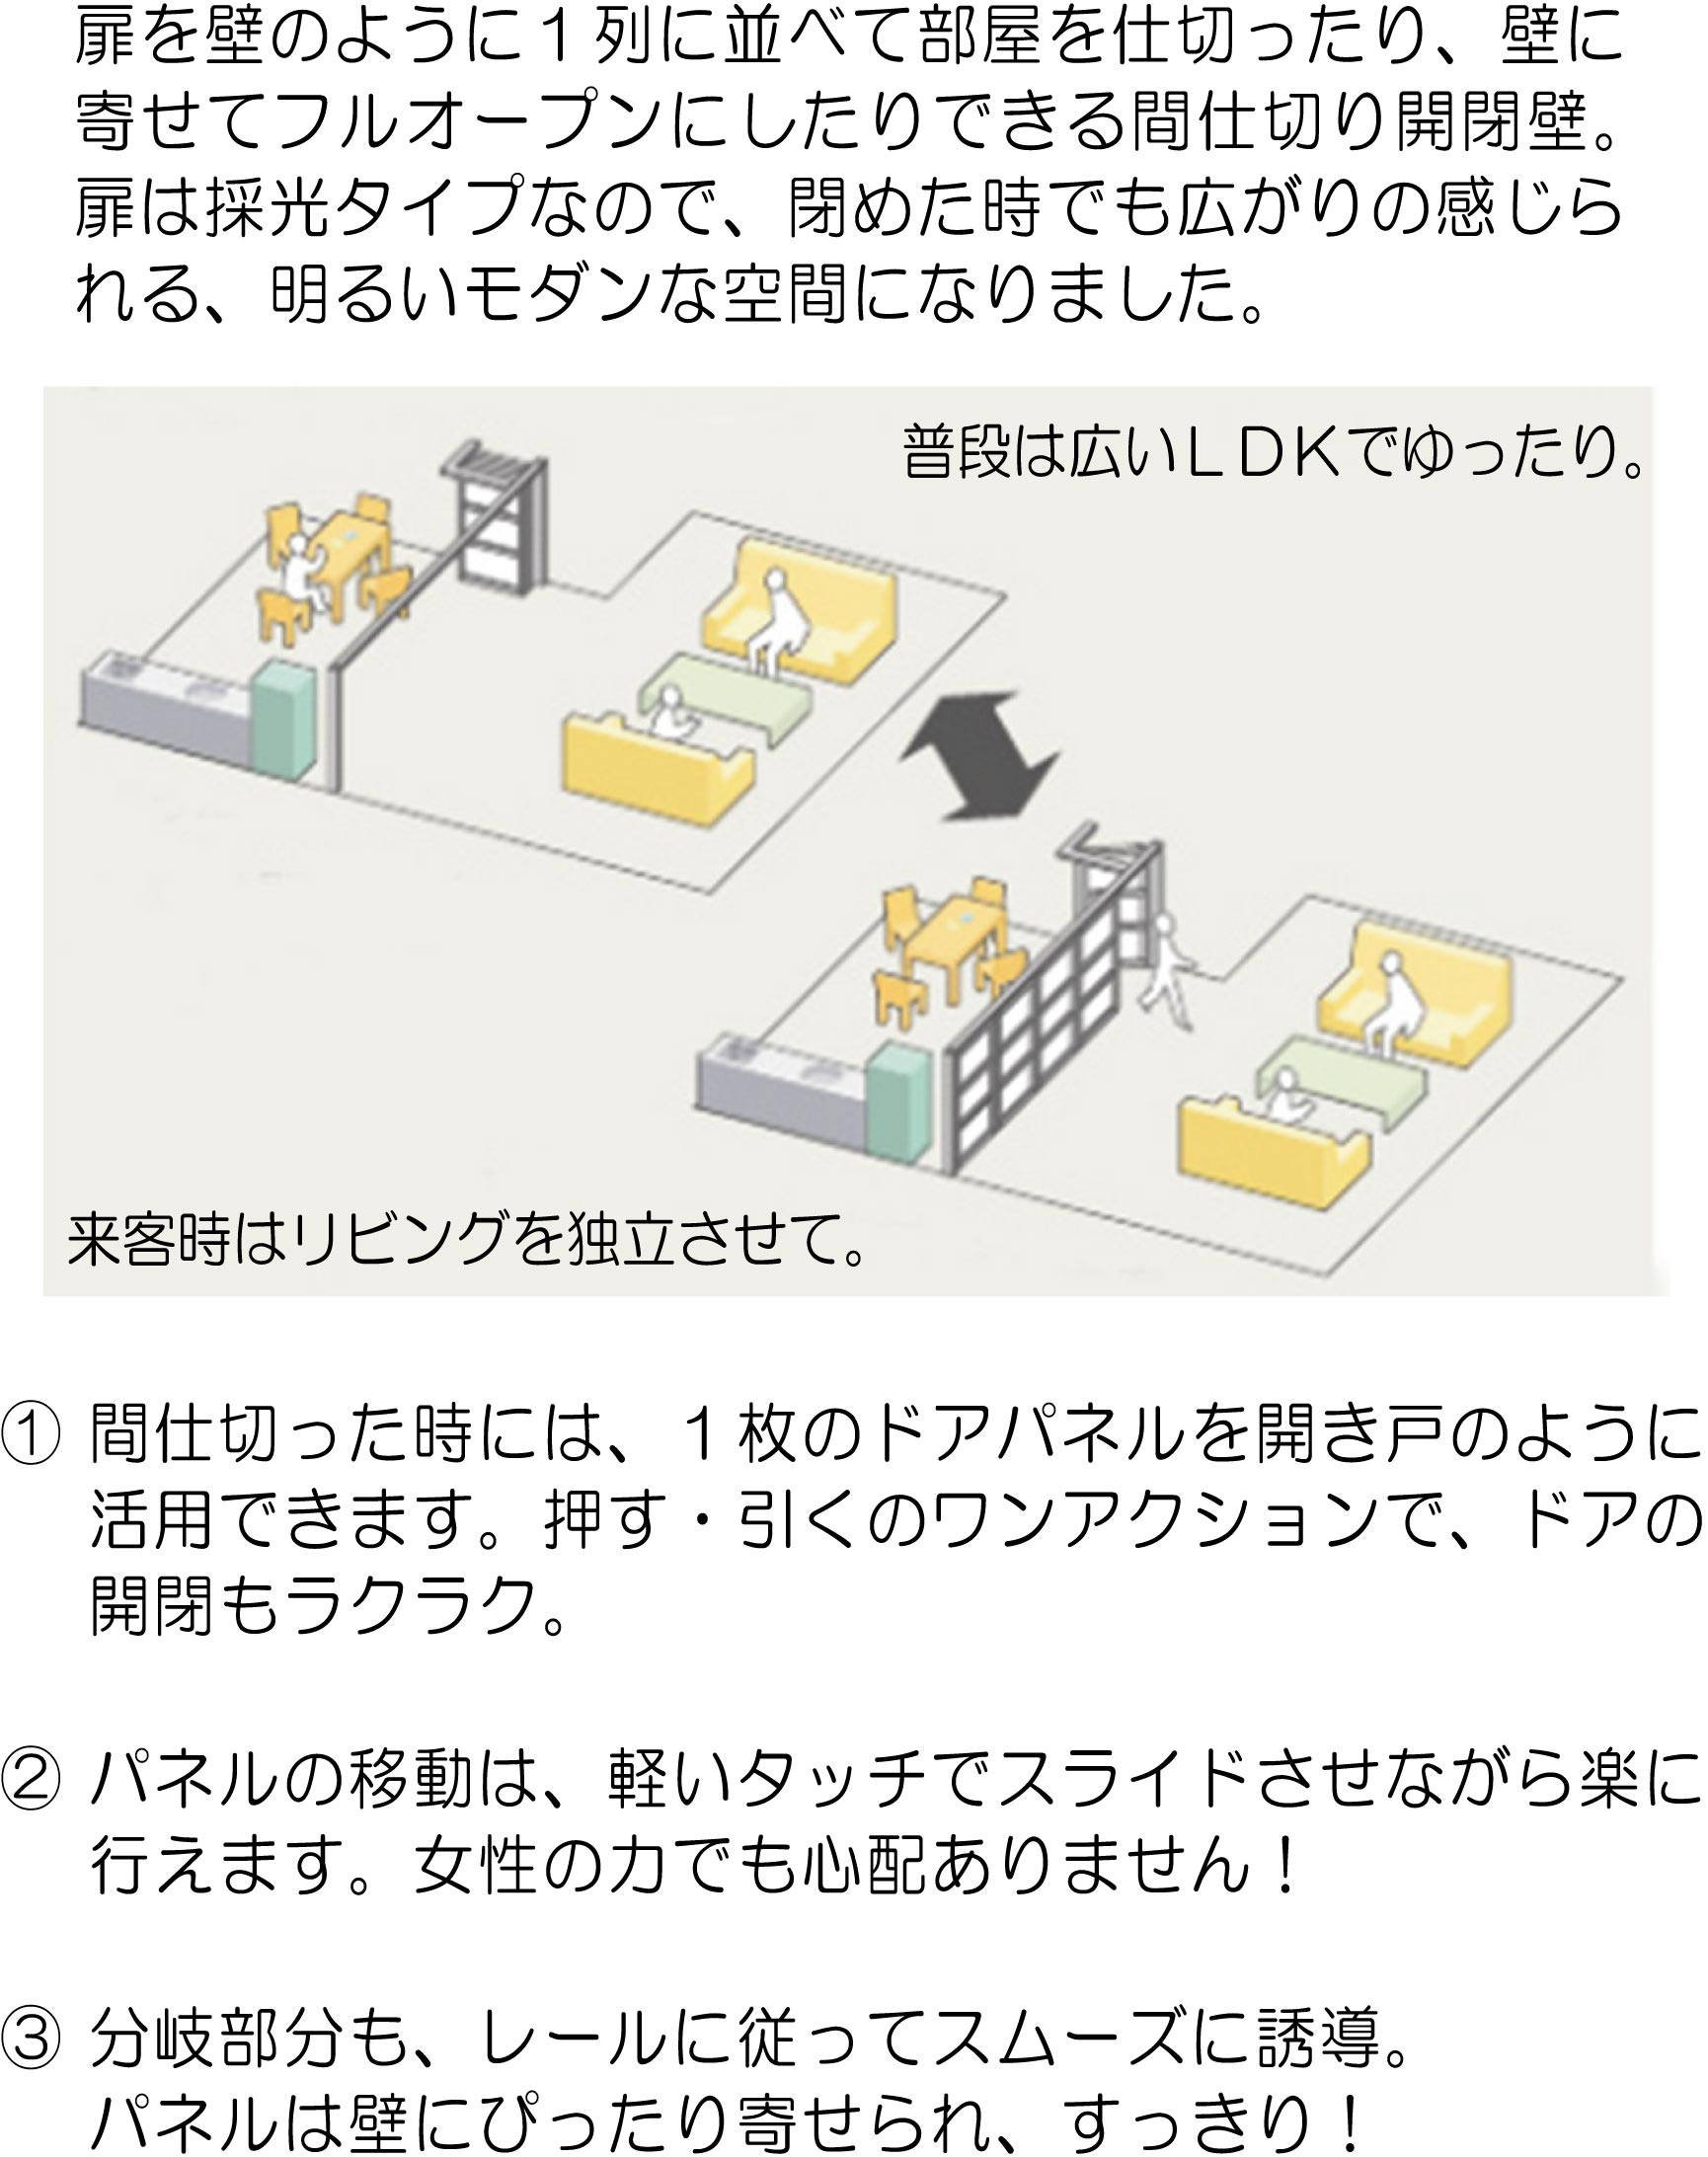 KuraSi-natu-sin79-09.jpg